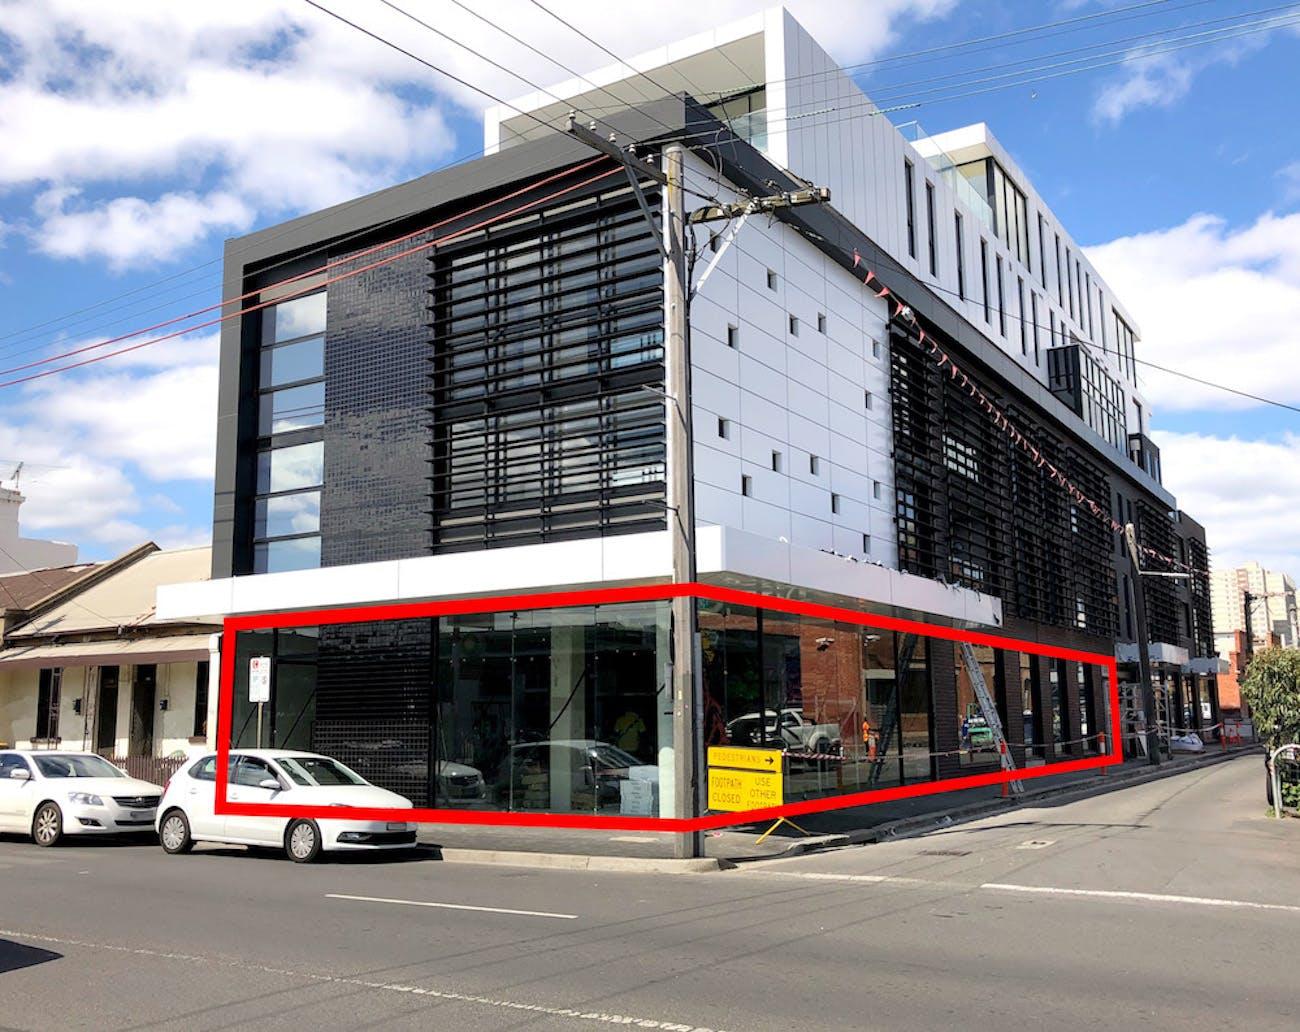 Johnston St, pop-up shop at Pop up Shop / Warehouse SPACE - Fitzroy, HUGE STREET FRONTAGE, image 1